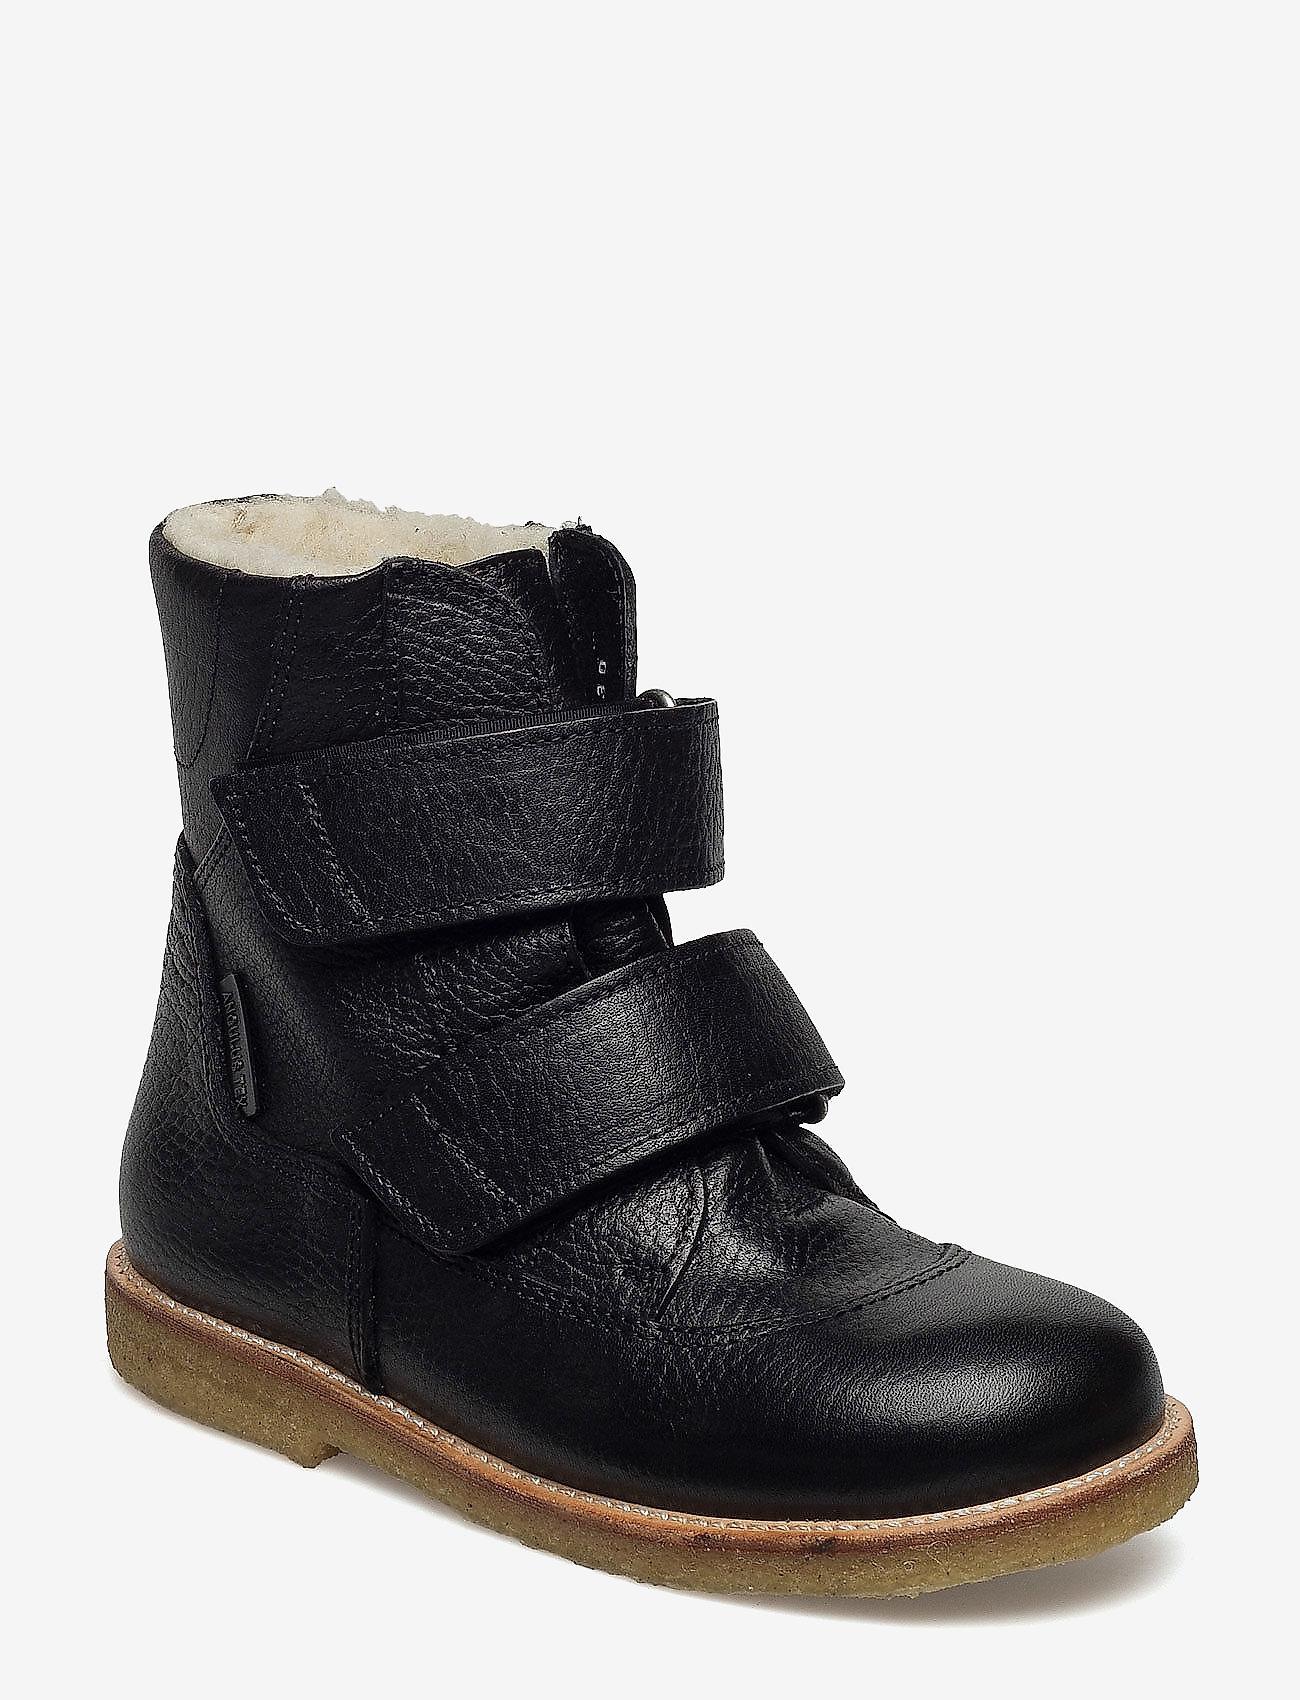 ANGULUS - Boots - flat - with velcro - vinterstövlar - 2504 black - 0